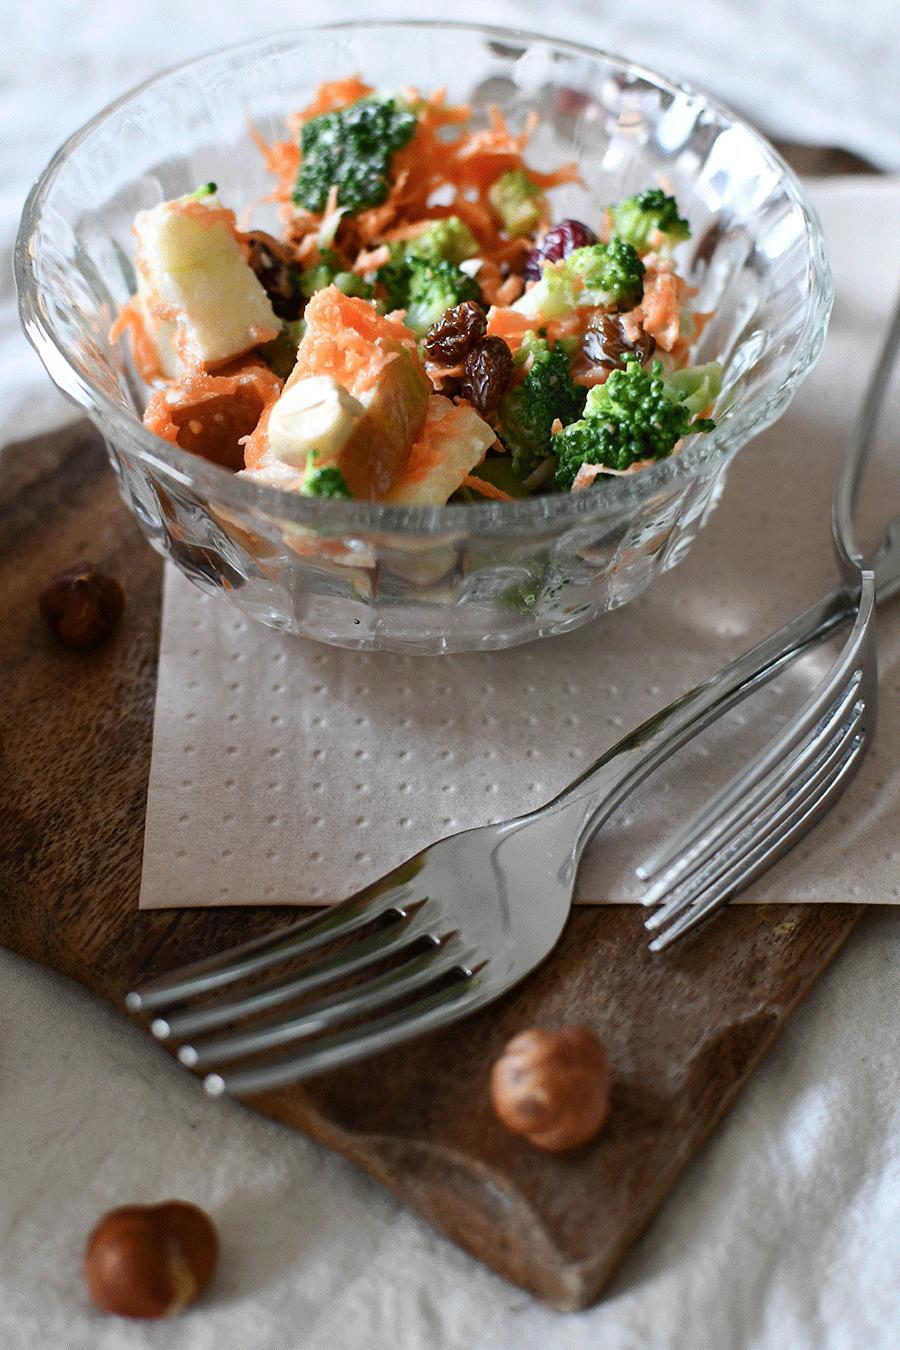 Brokkolisalat mit Joghurt - Dressing